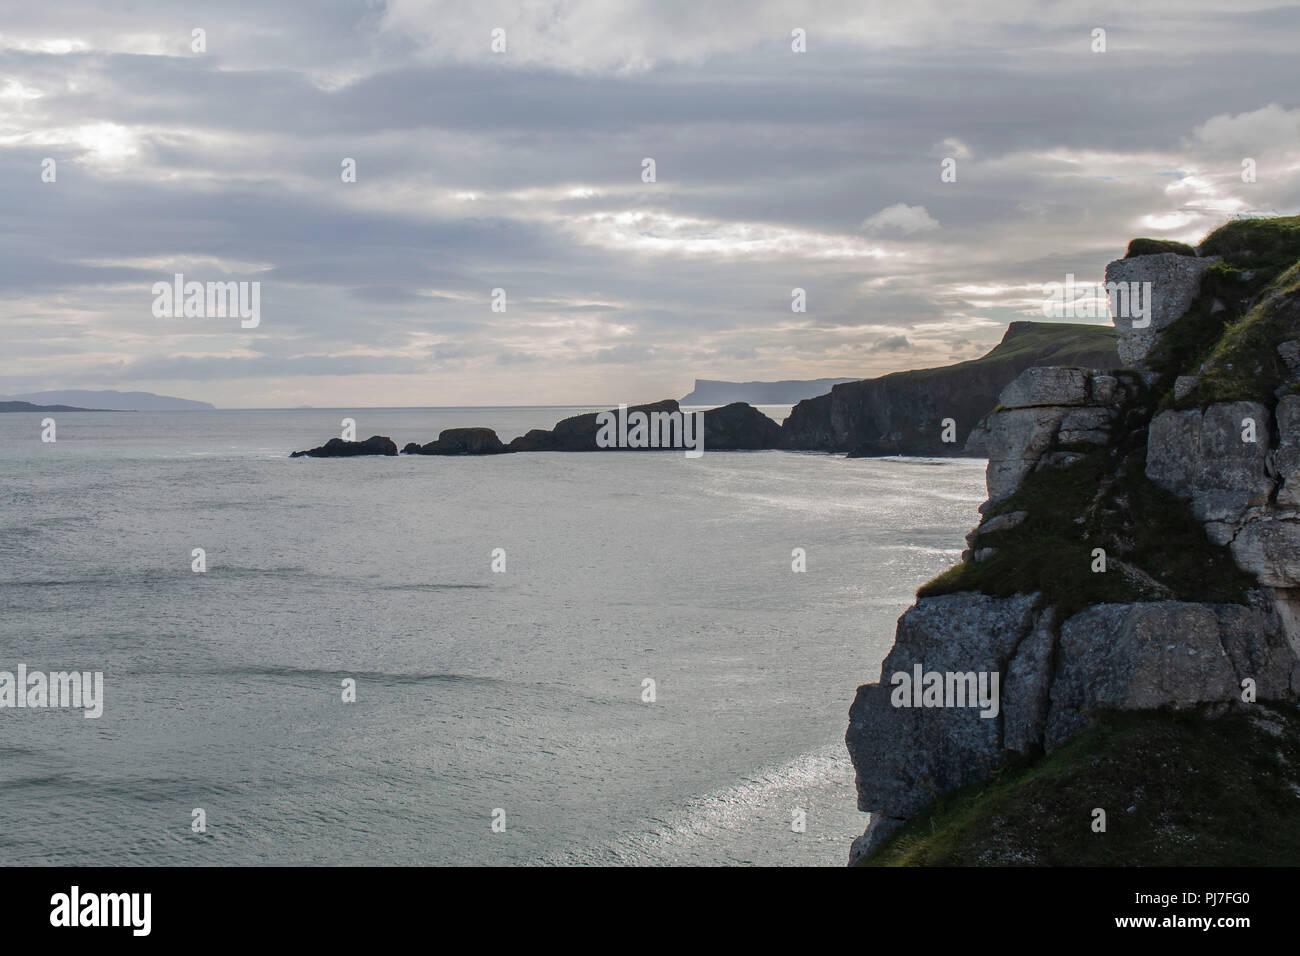 Cliffs around carric a reed bridge in ireland - Stock Image